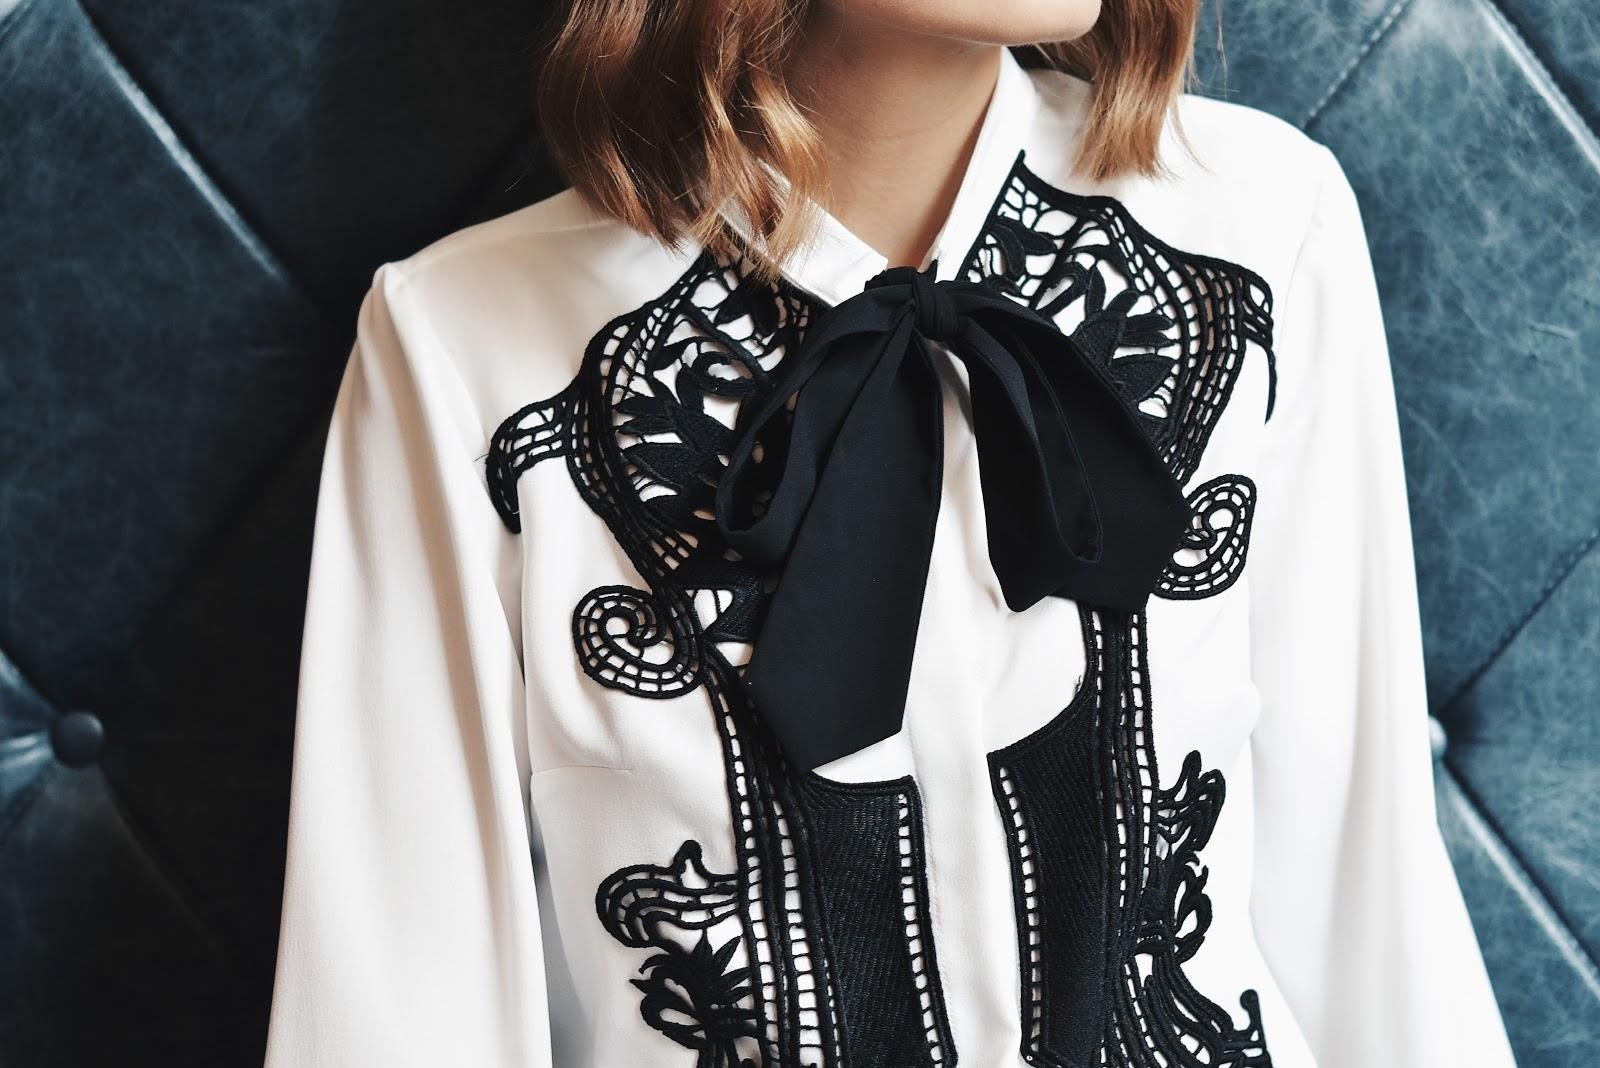 TOVA UBRANIA | blog o modzie | moda